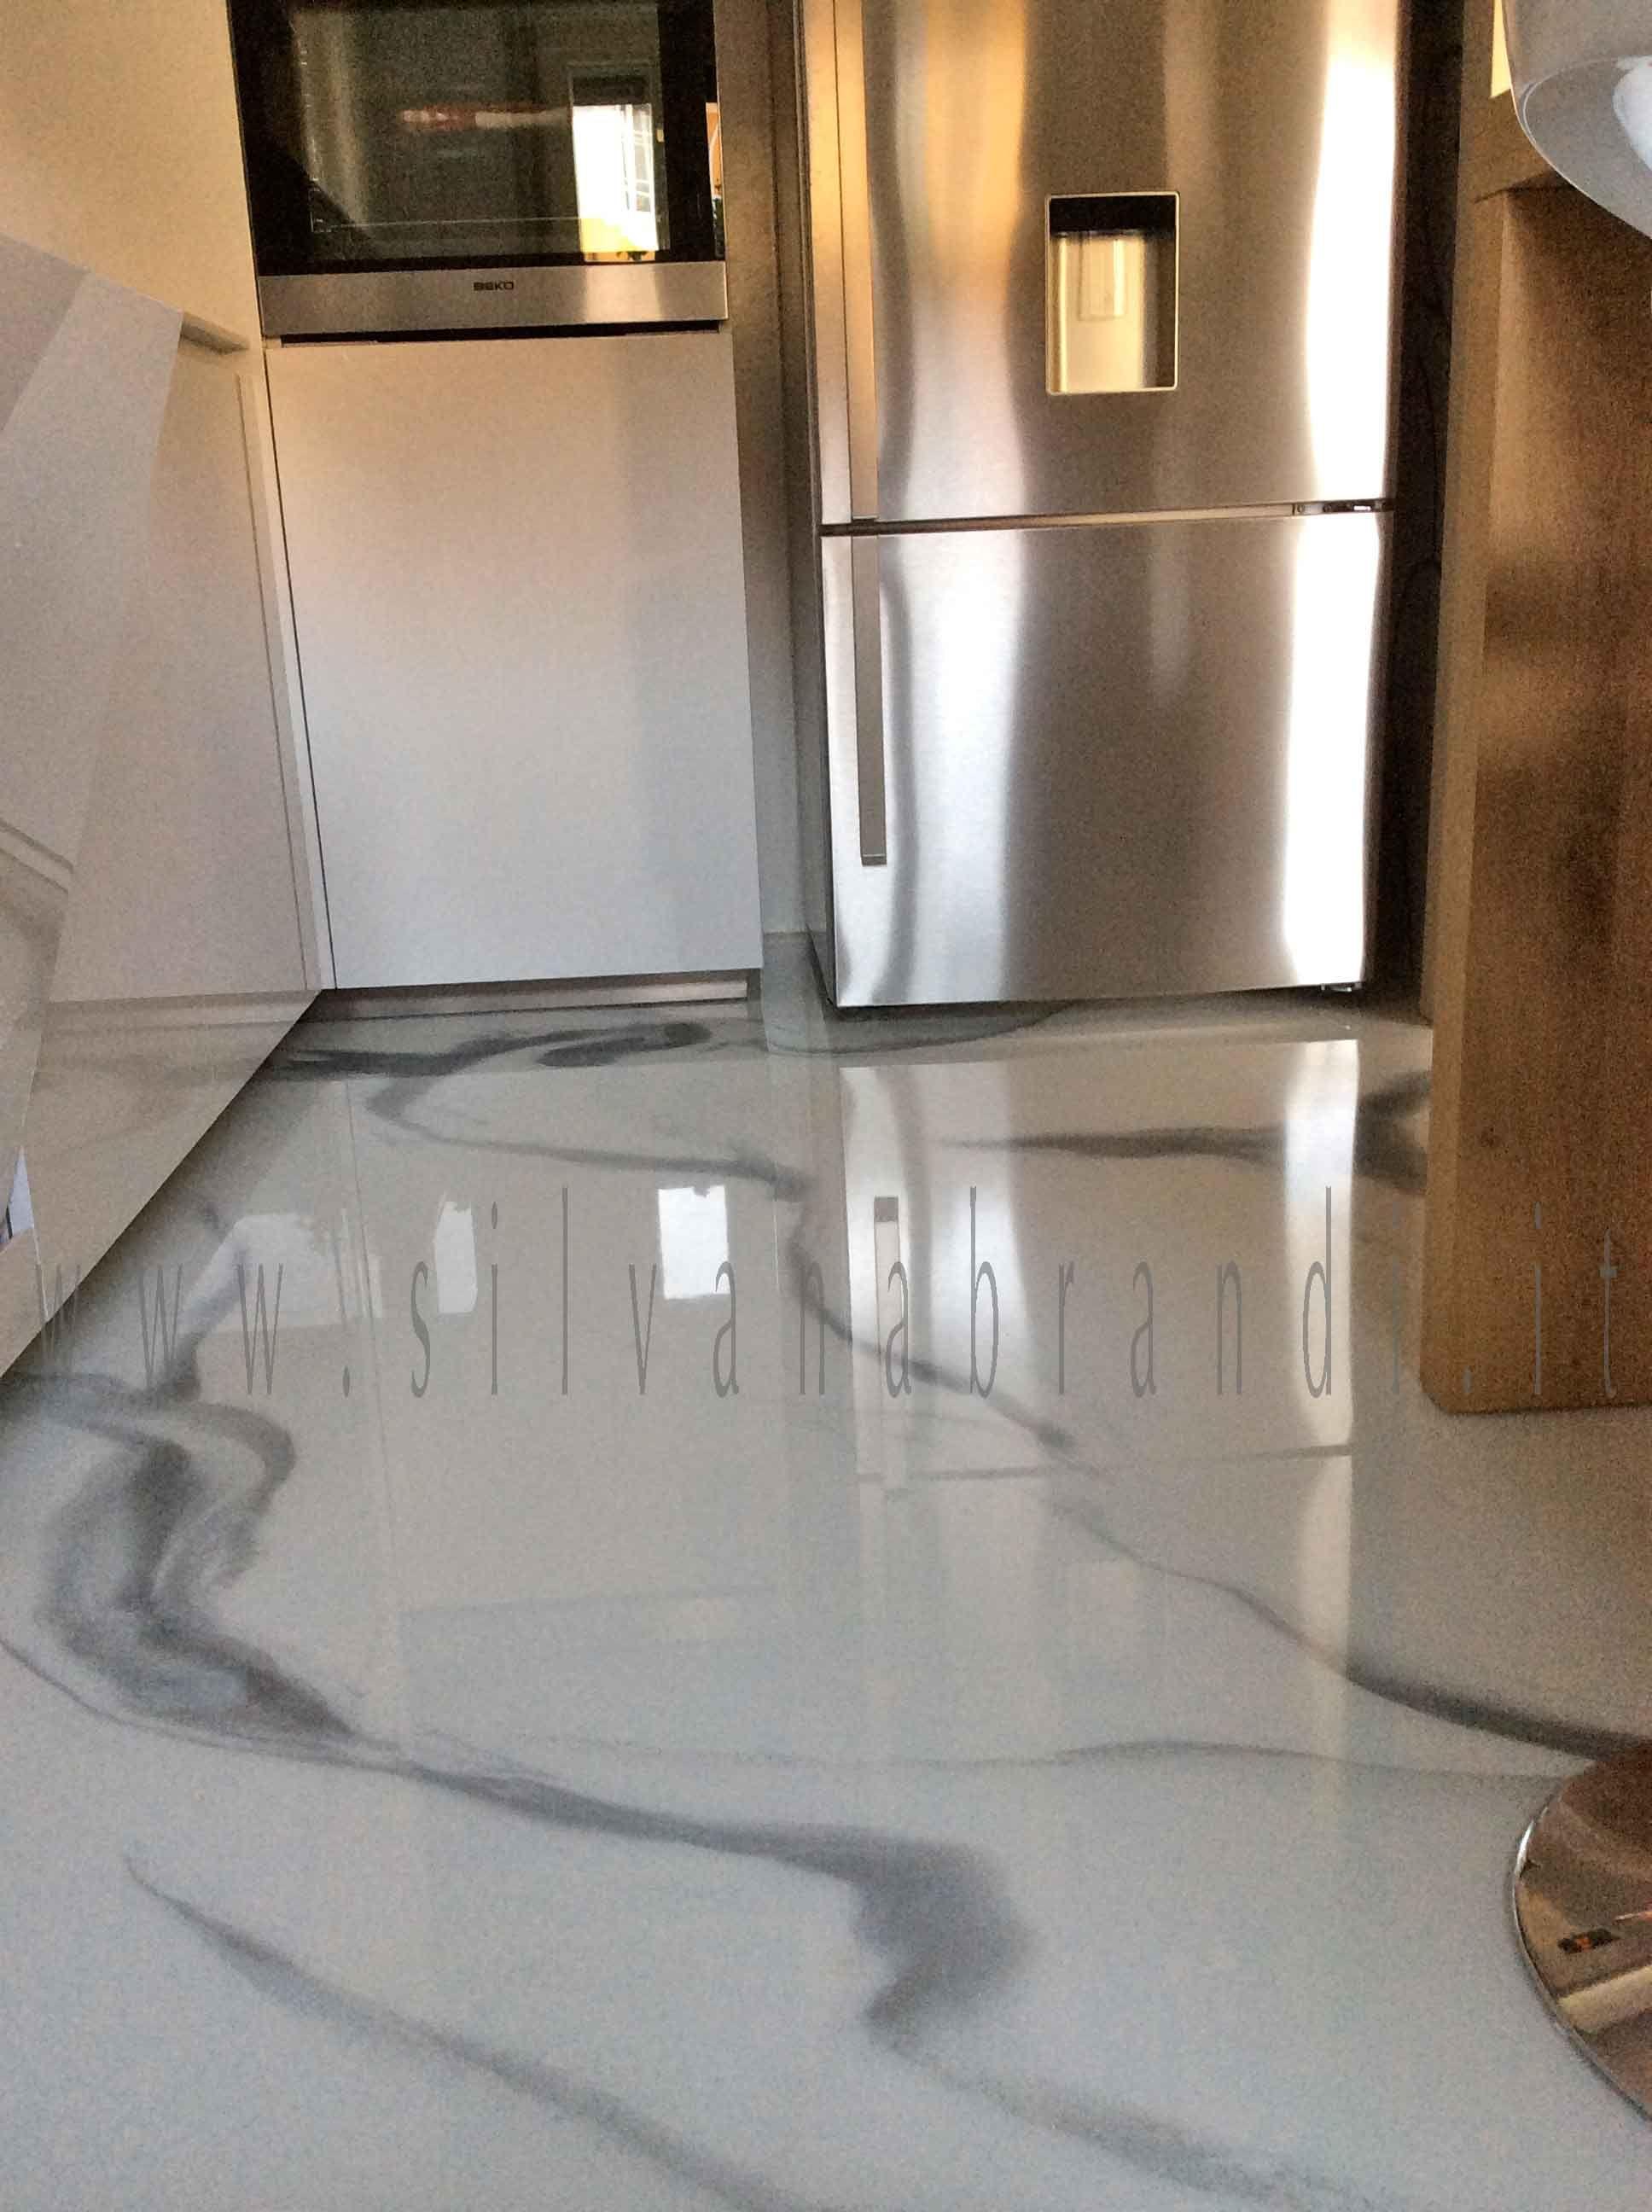 Rivestimento cucina in resina decorata effetto marmo silvana brandi resina pinterest - Silvana in cucina ...